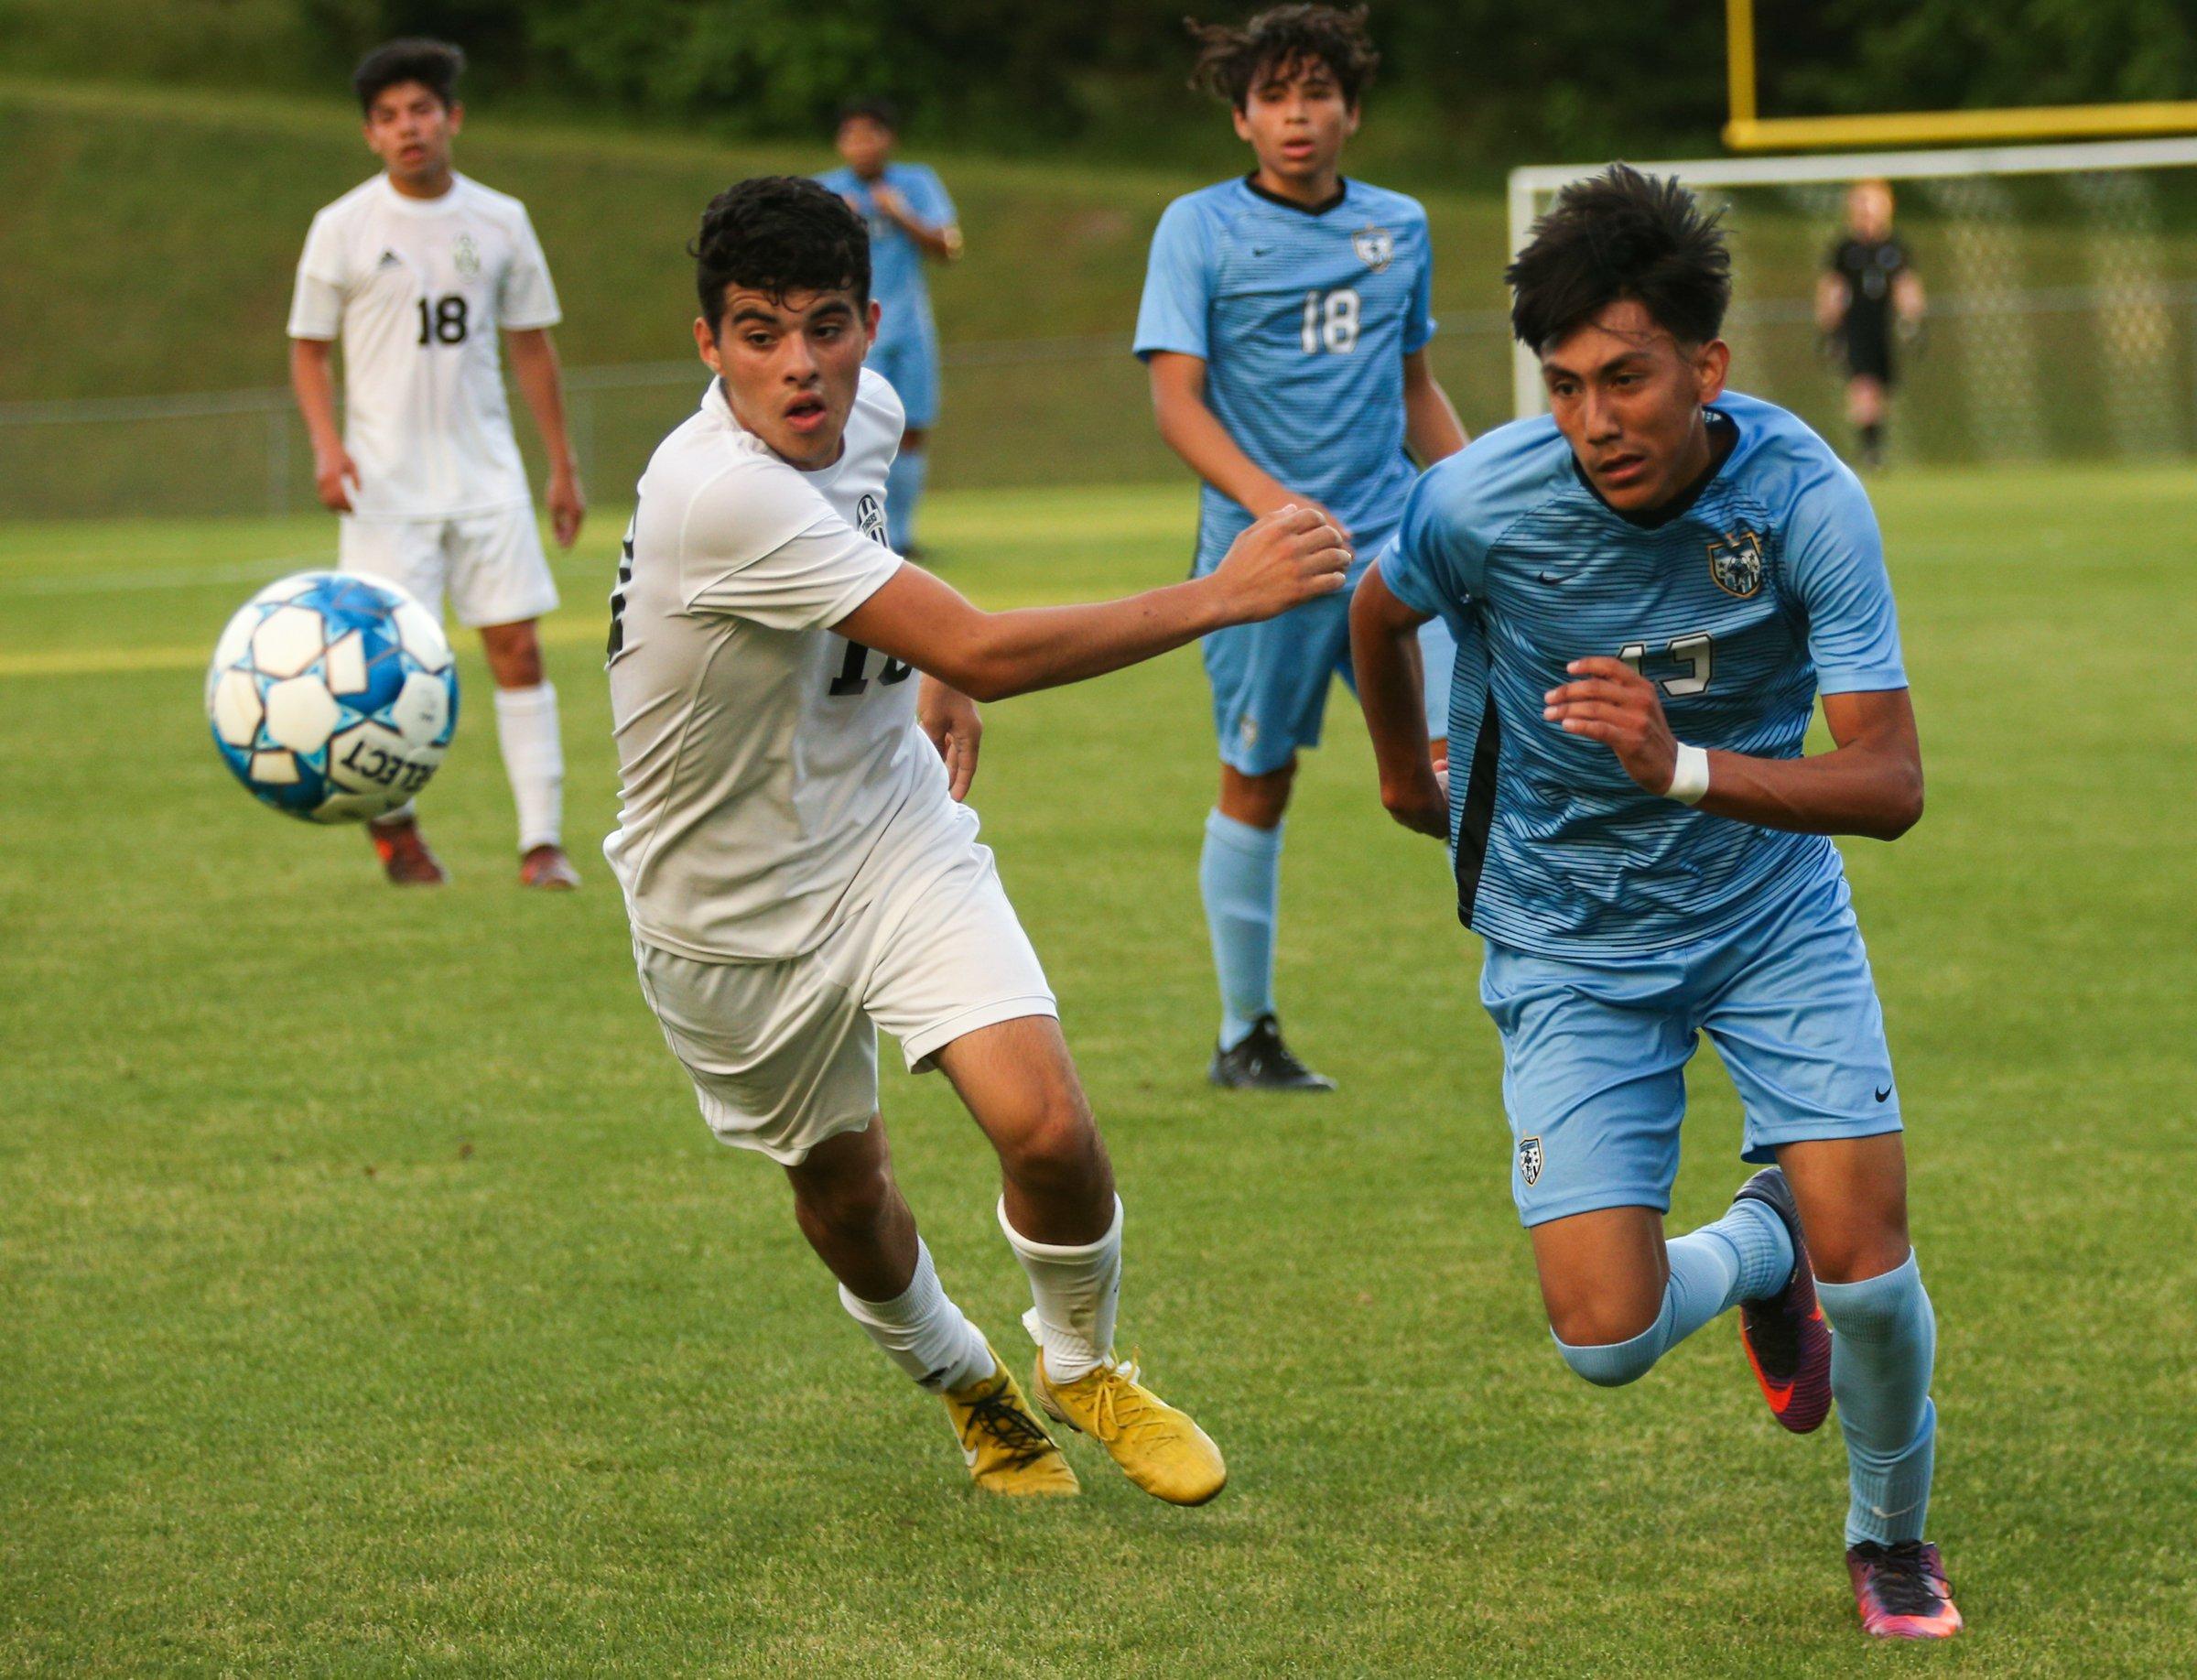 High school soccer: Johnson seniors shine in 5A